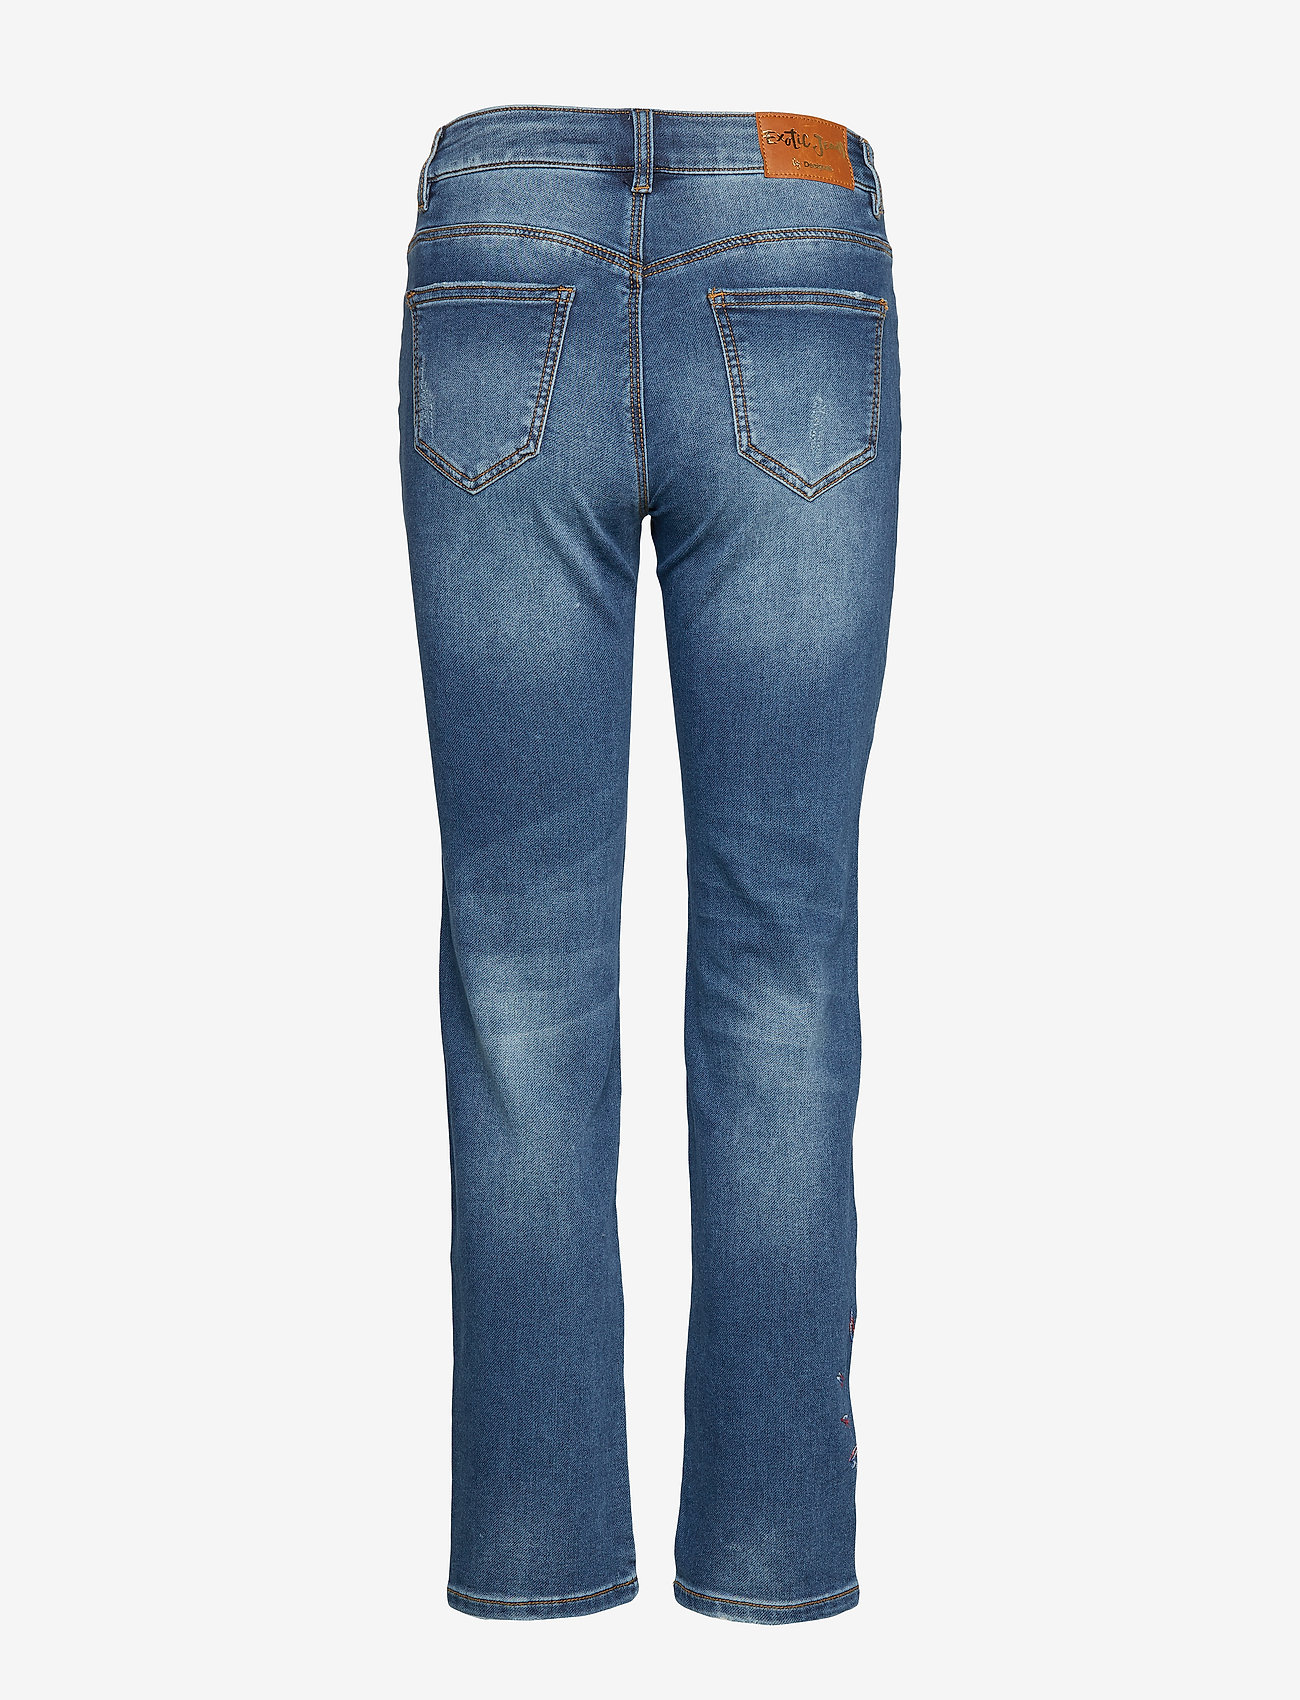 Desigual - DENIM SANFORD - jeans droites - denim dark blue - 1